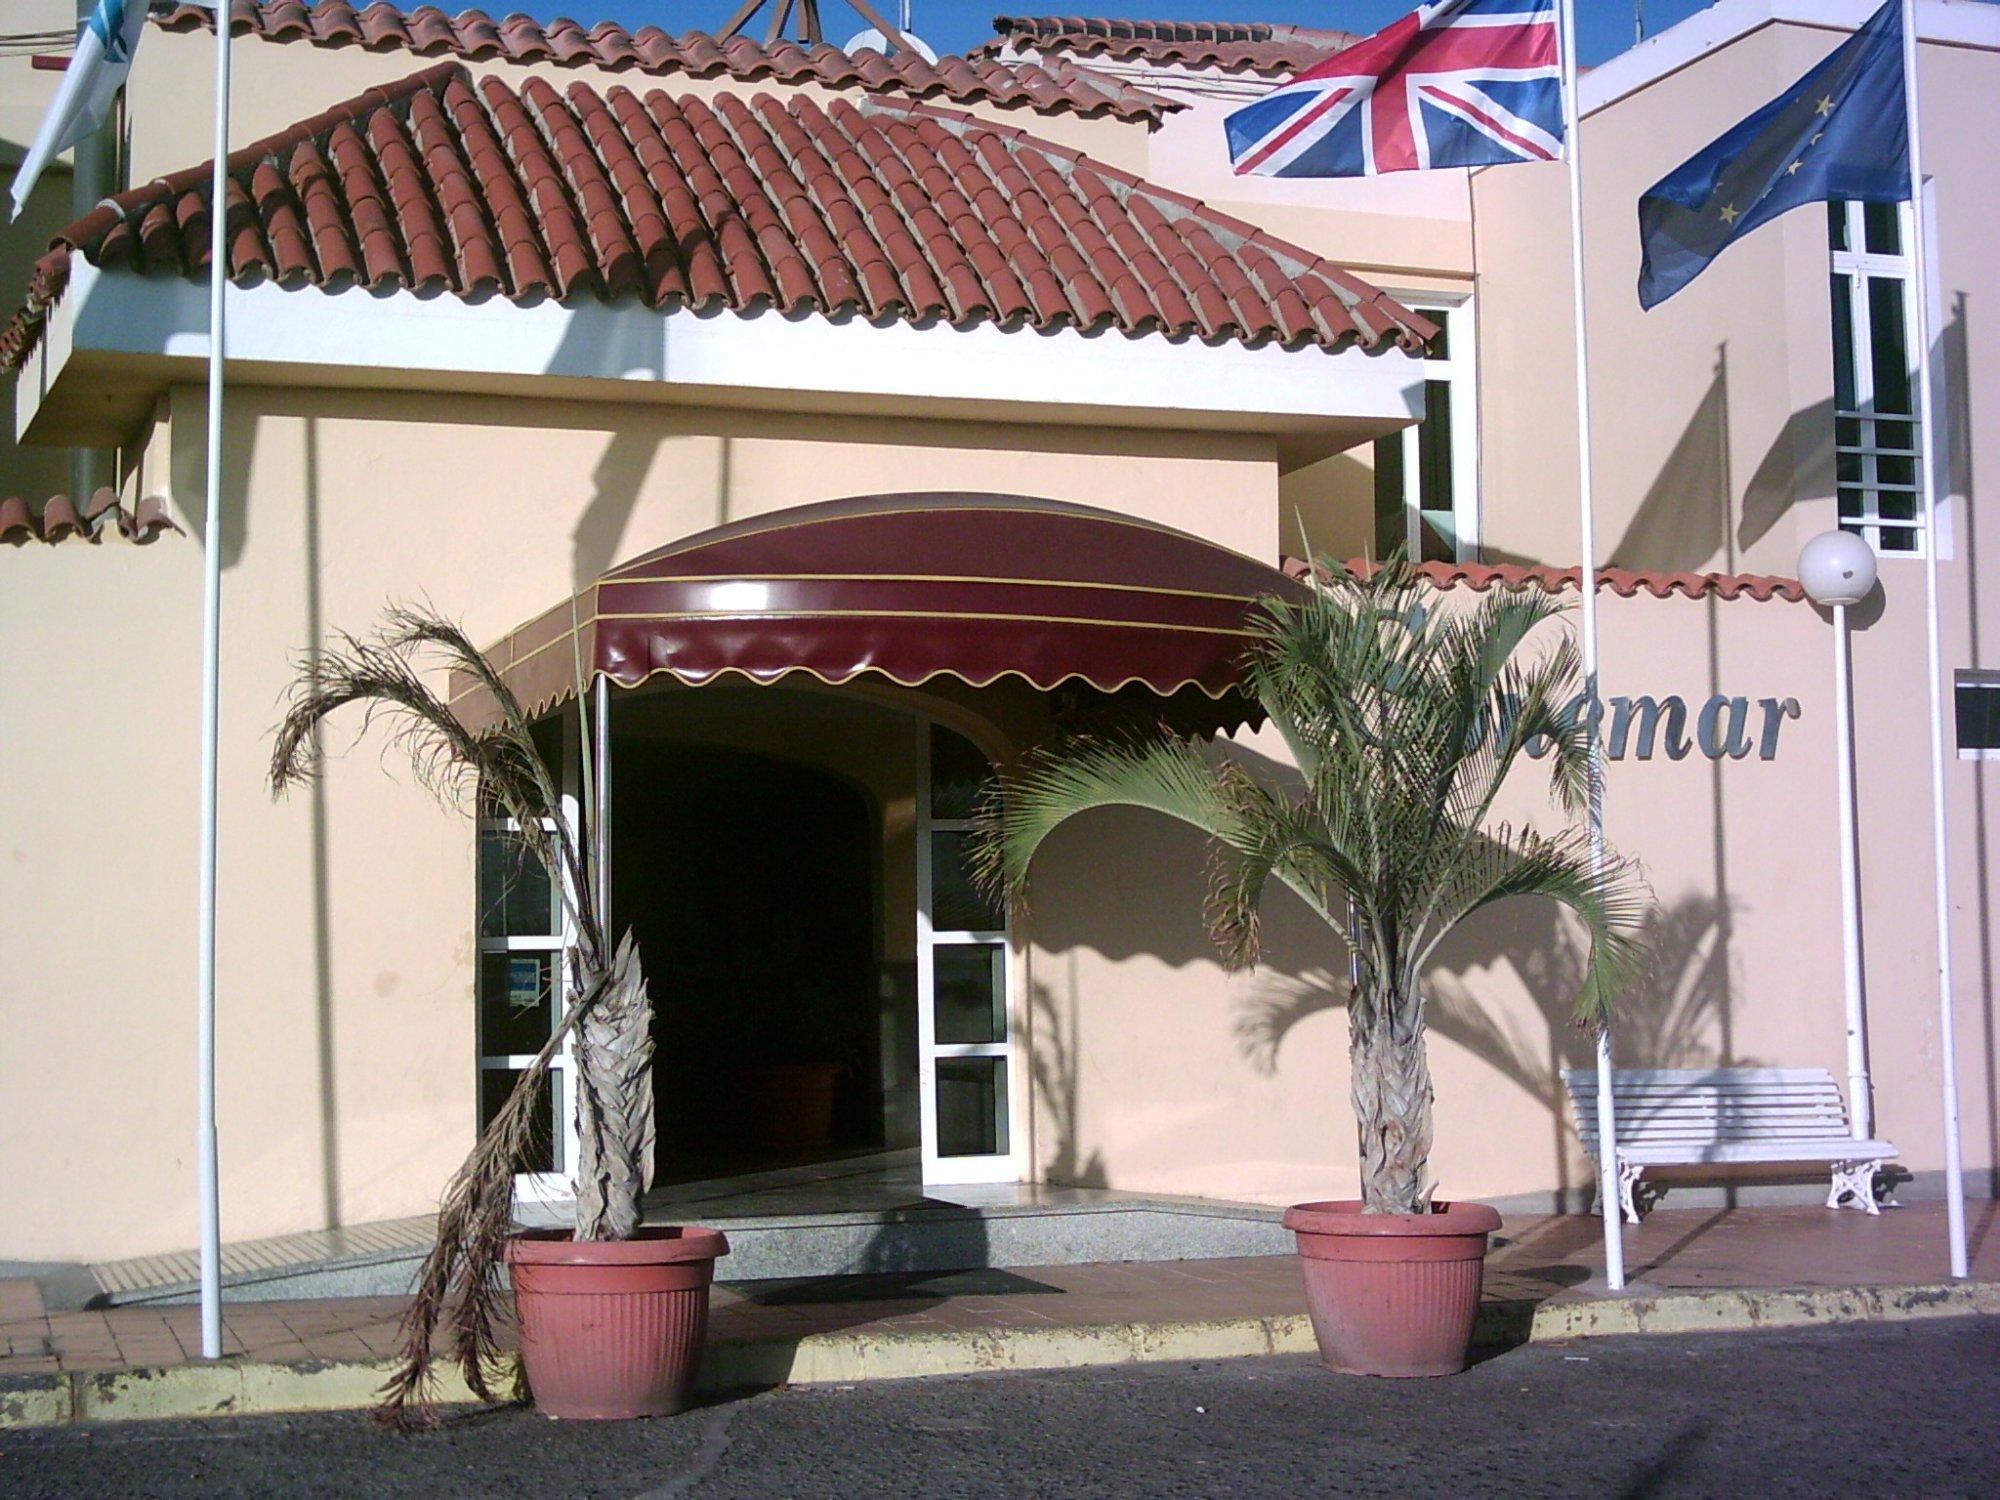 Sonemar Apartments